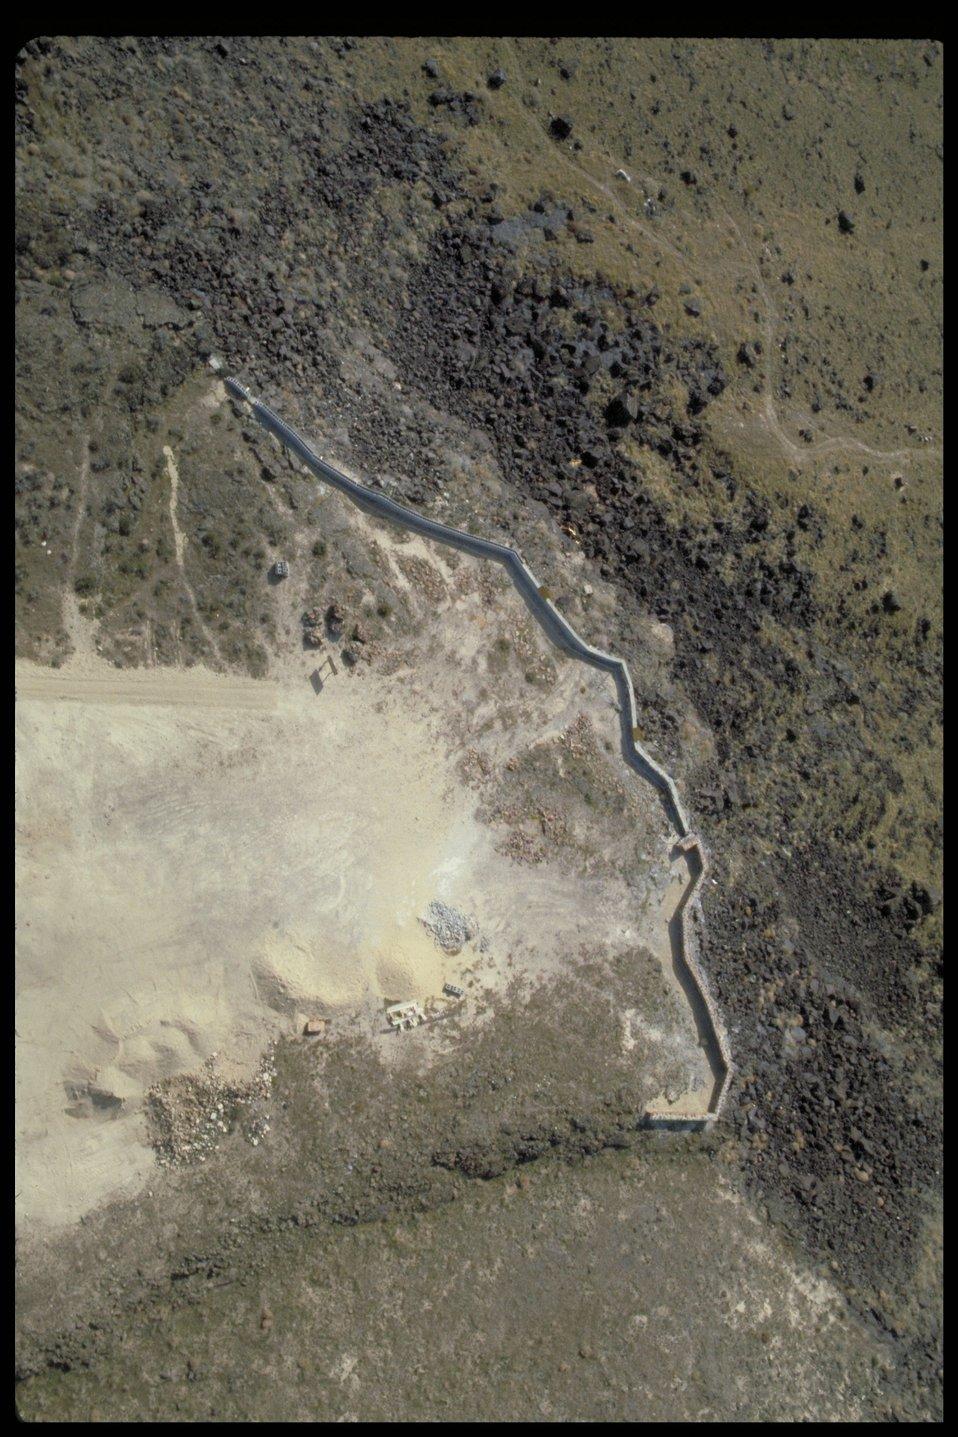 Dedication Point Aerial  Birds of Prey National Conservation Area  BOP  Owyhee Field Office  LSRD  Lower Snake River District